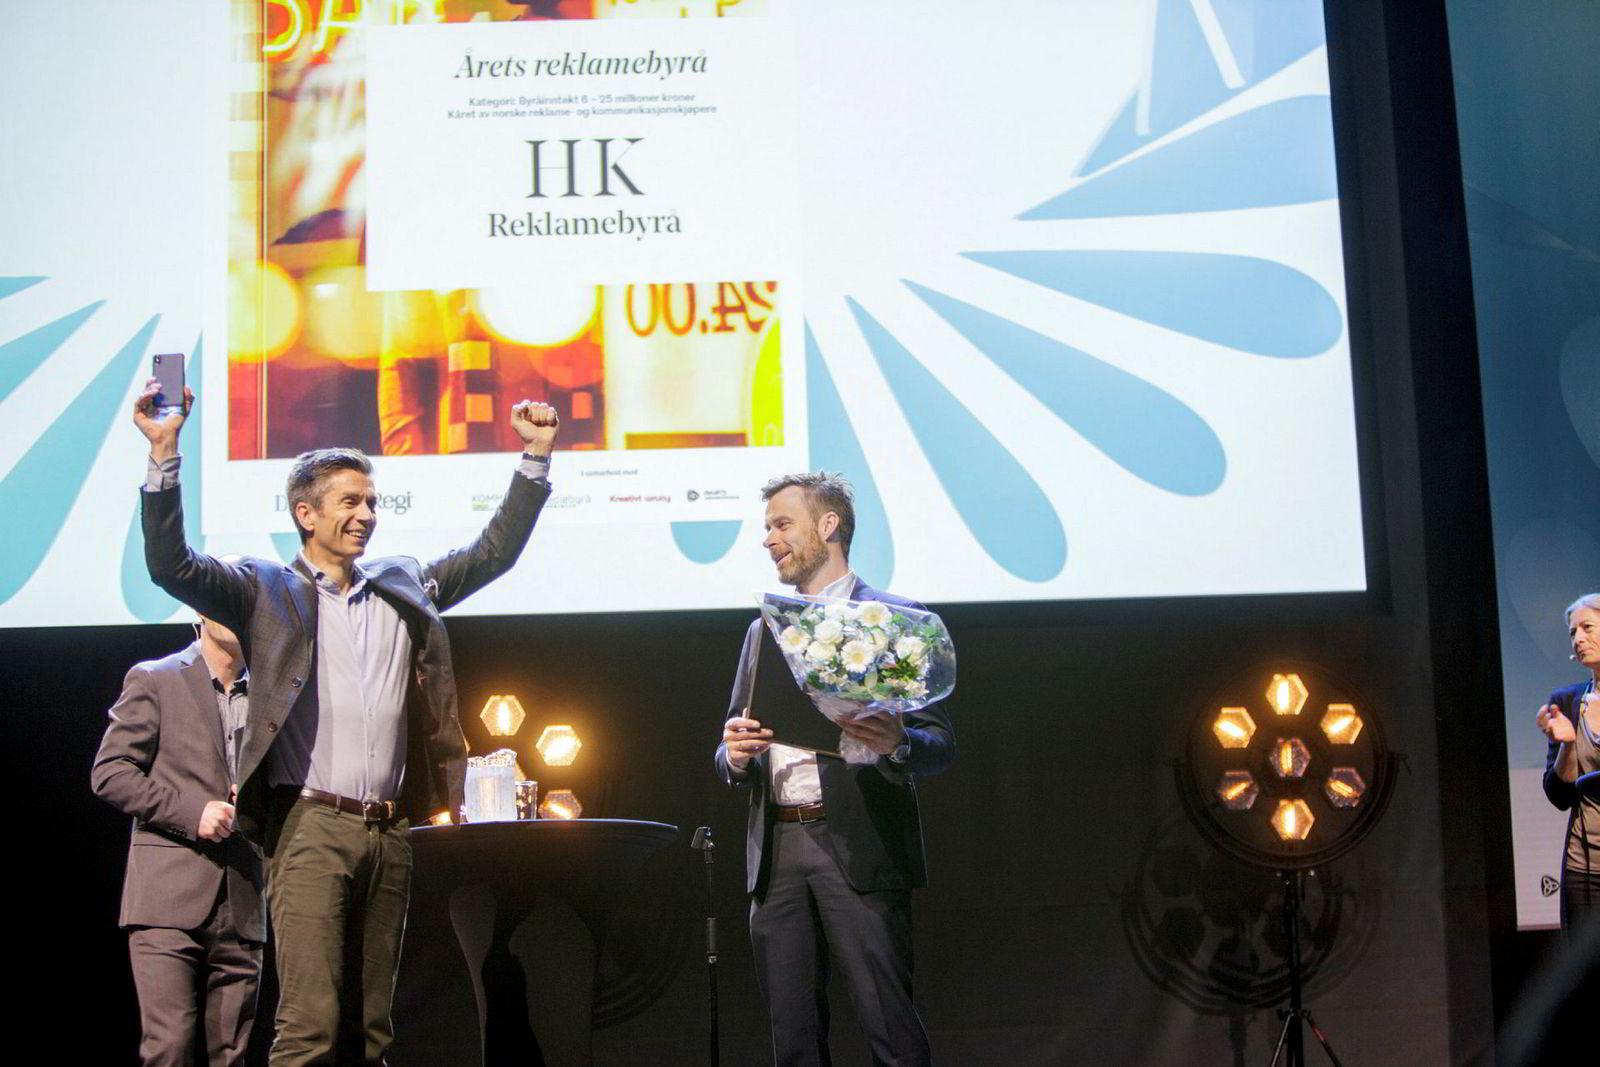 HK Vant Årets reklamebyrå 25–50 millioner kroner for andre år på rad.